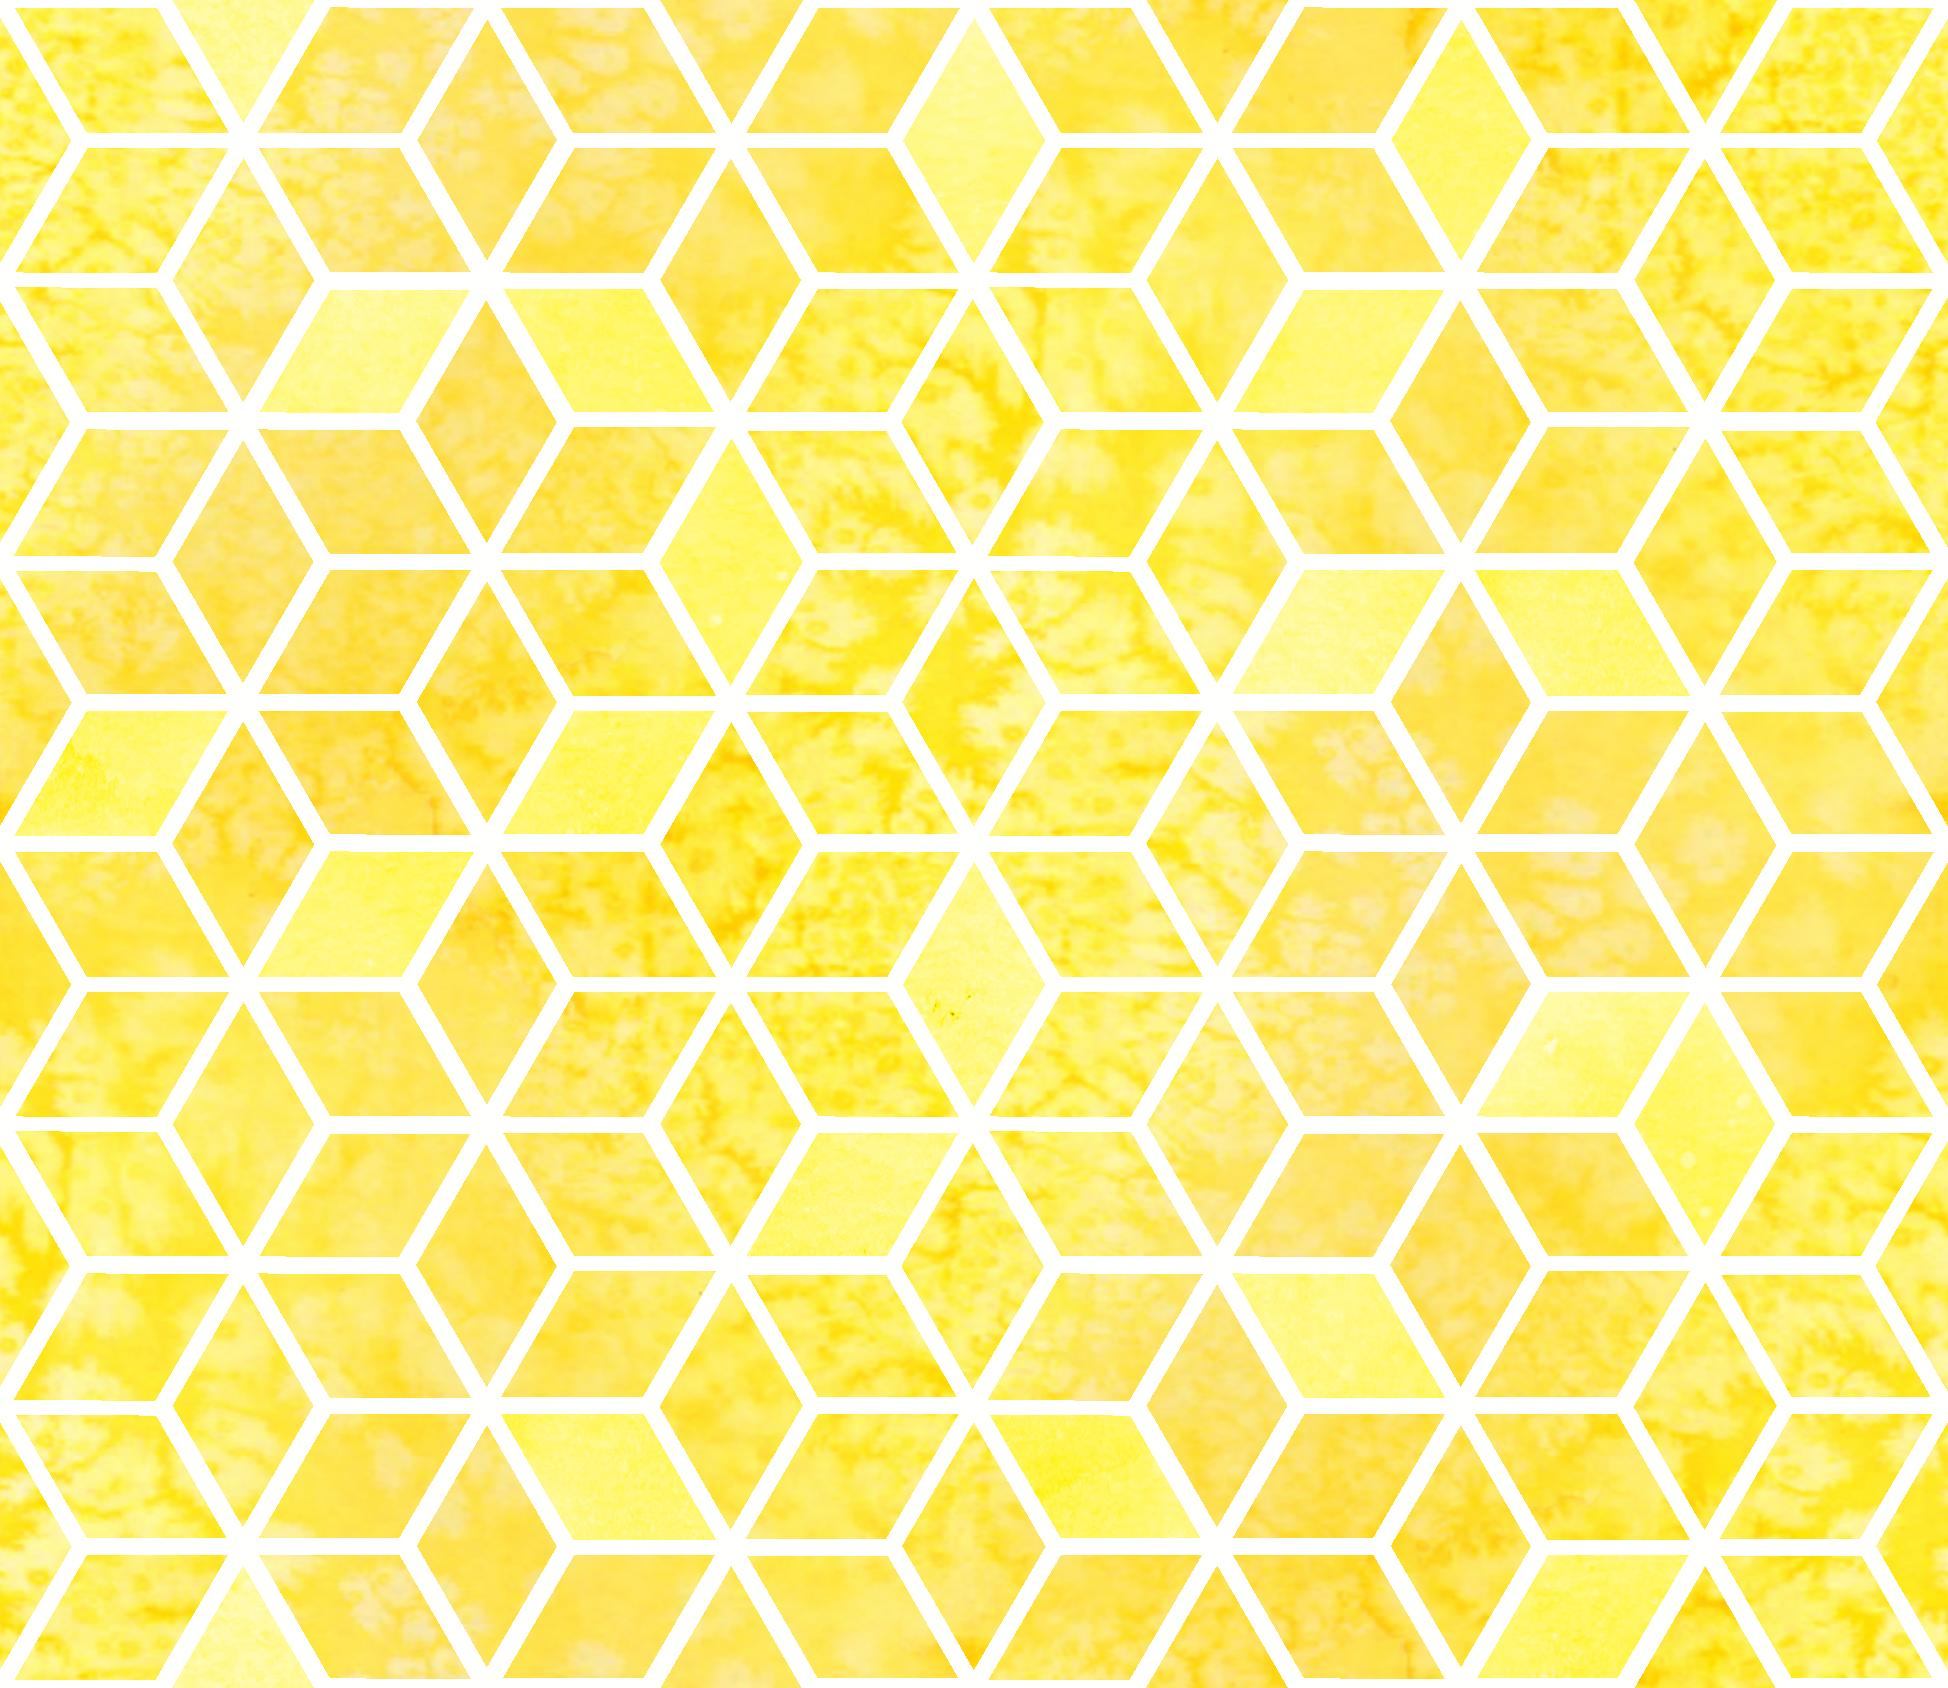 6521543_hexagon_yellow.png